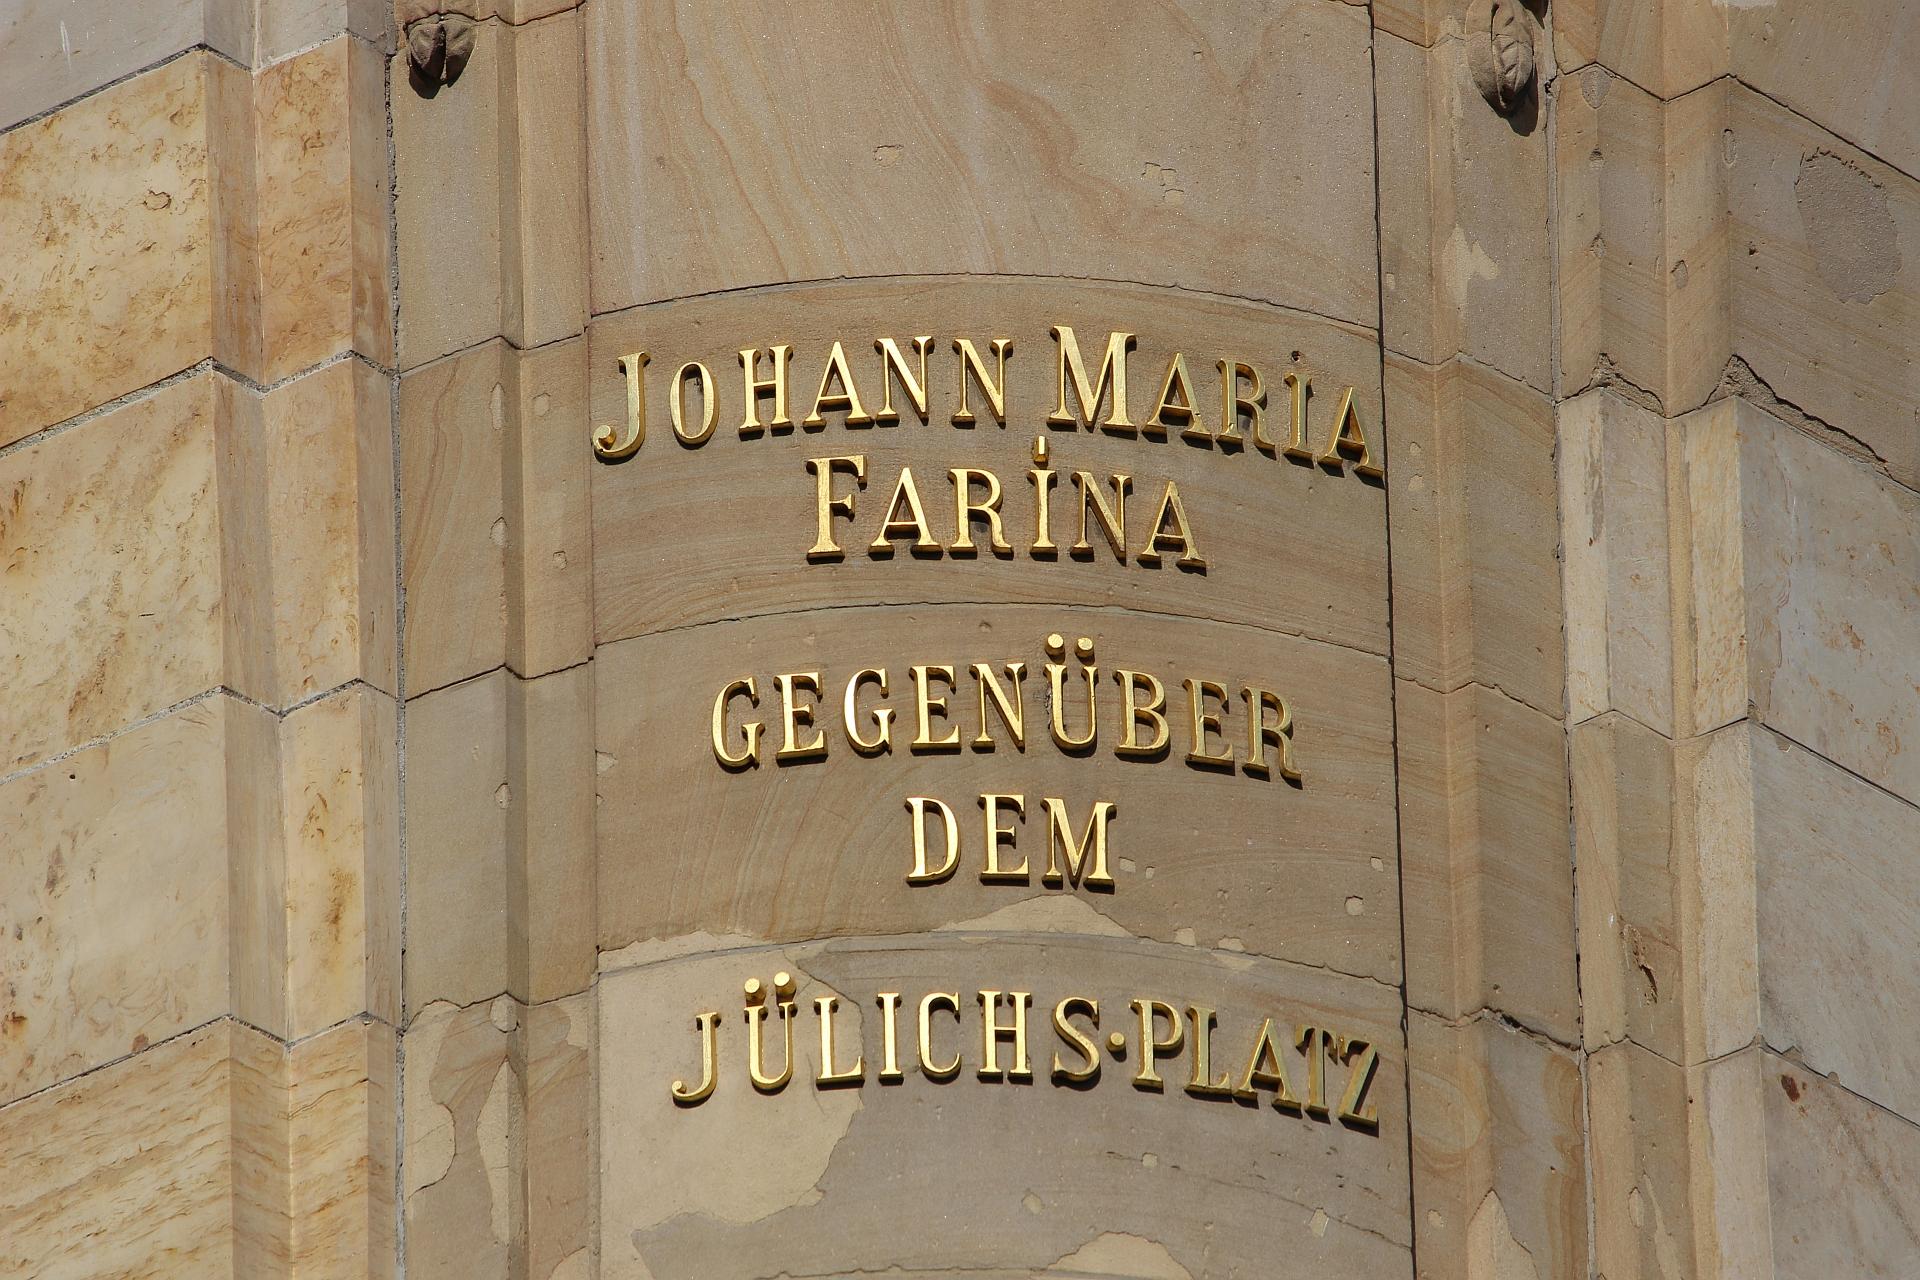 Johann Maria Farina gegenüber dem Jülichs-Platz